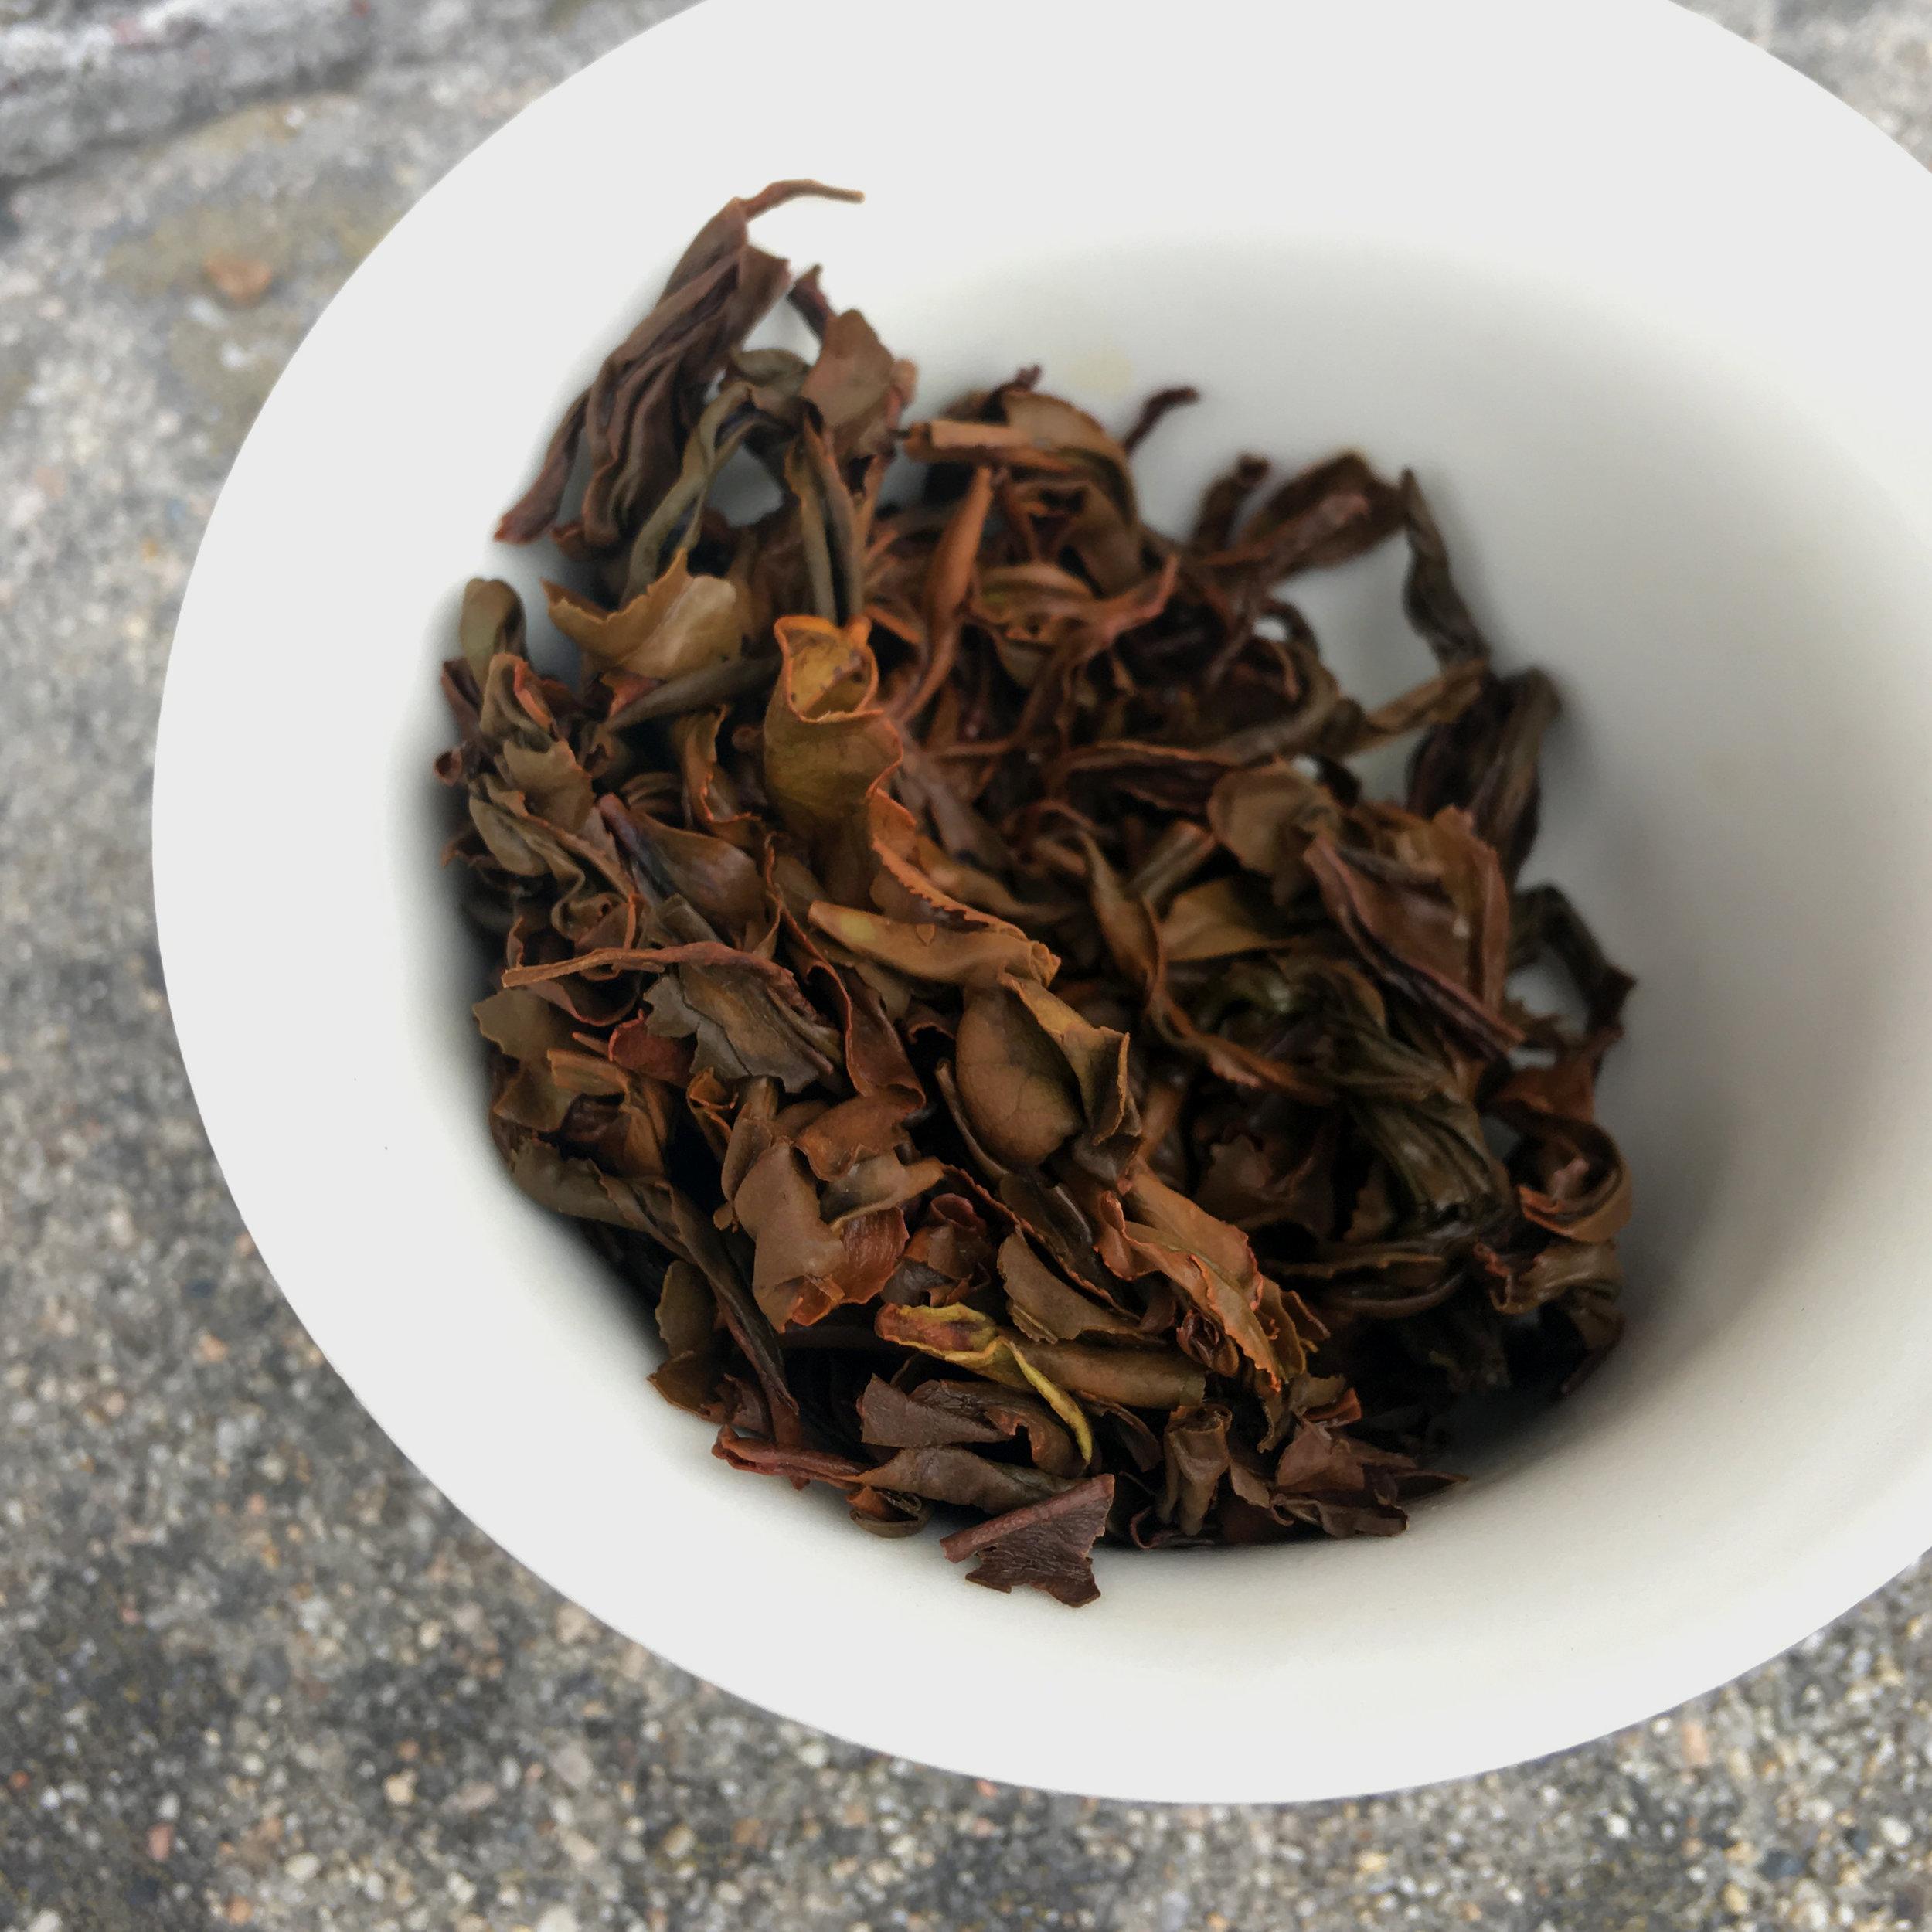 golden-peony-jin-mudan-black-tea-china-itw1-2019a.jpg